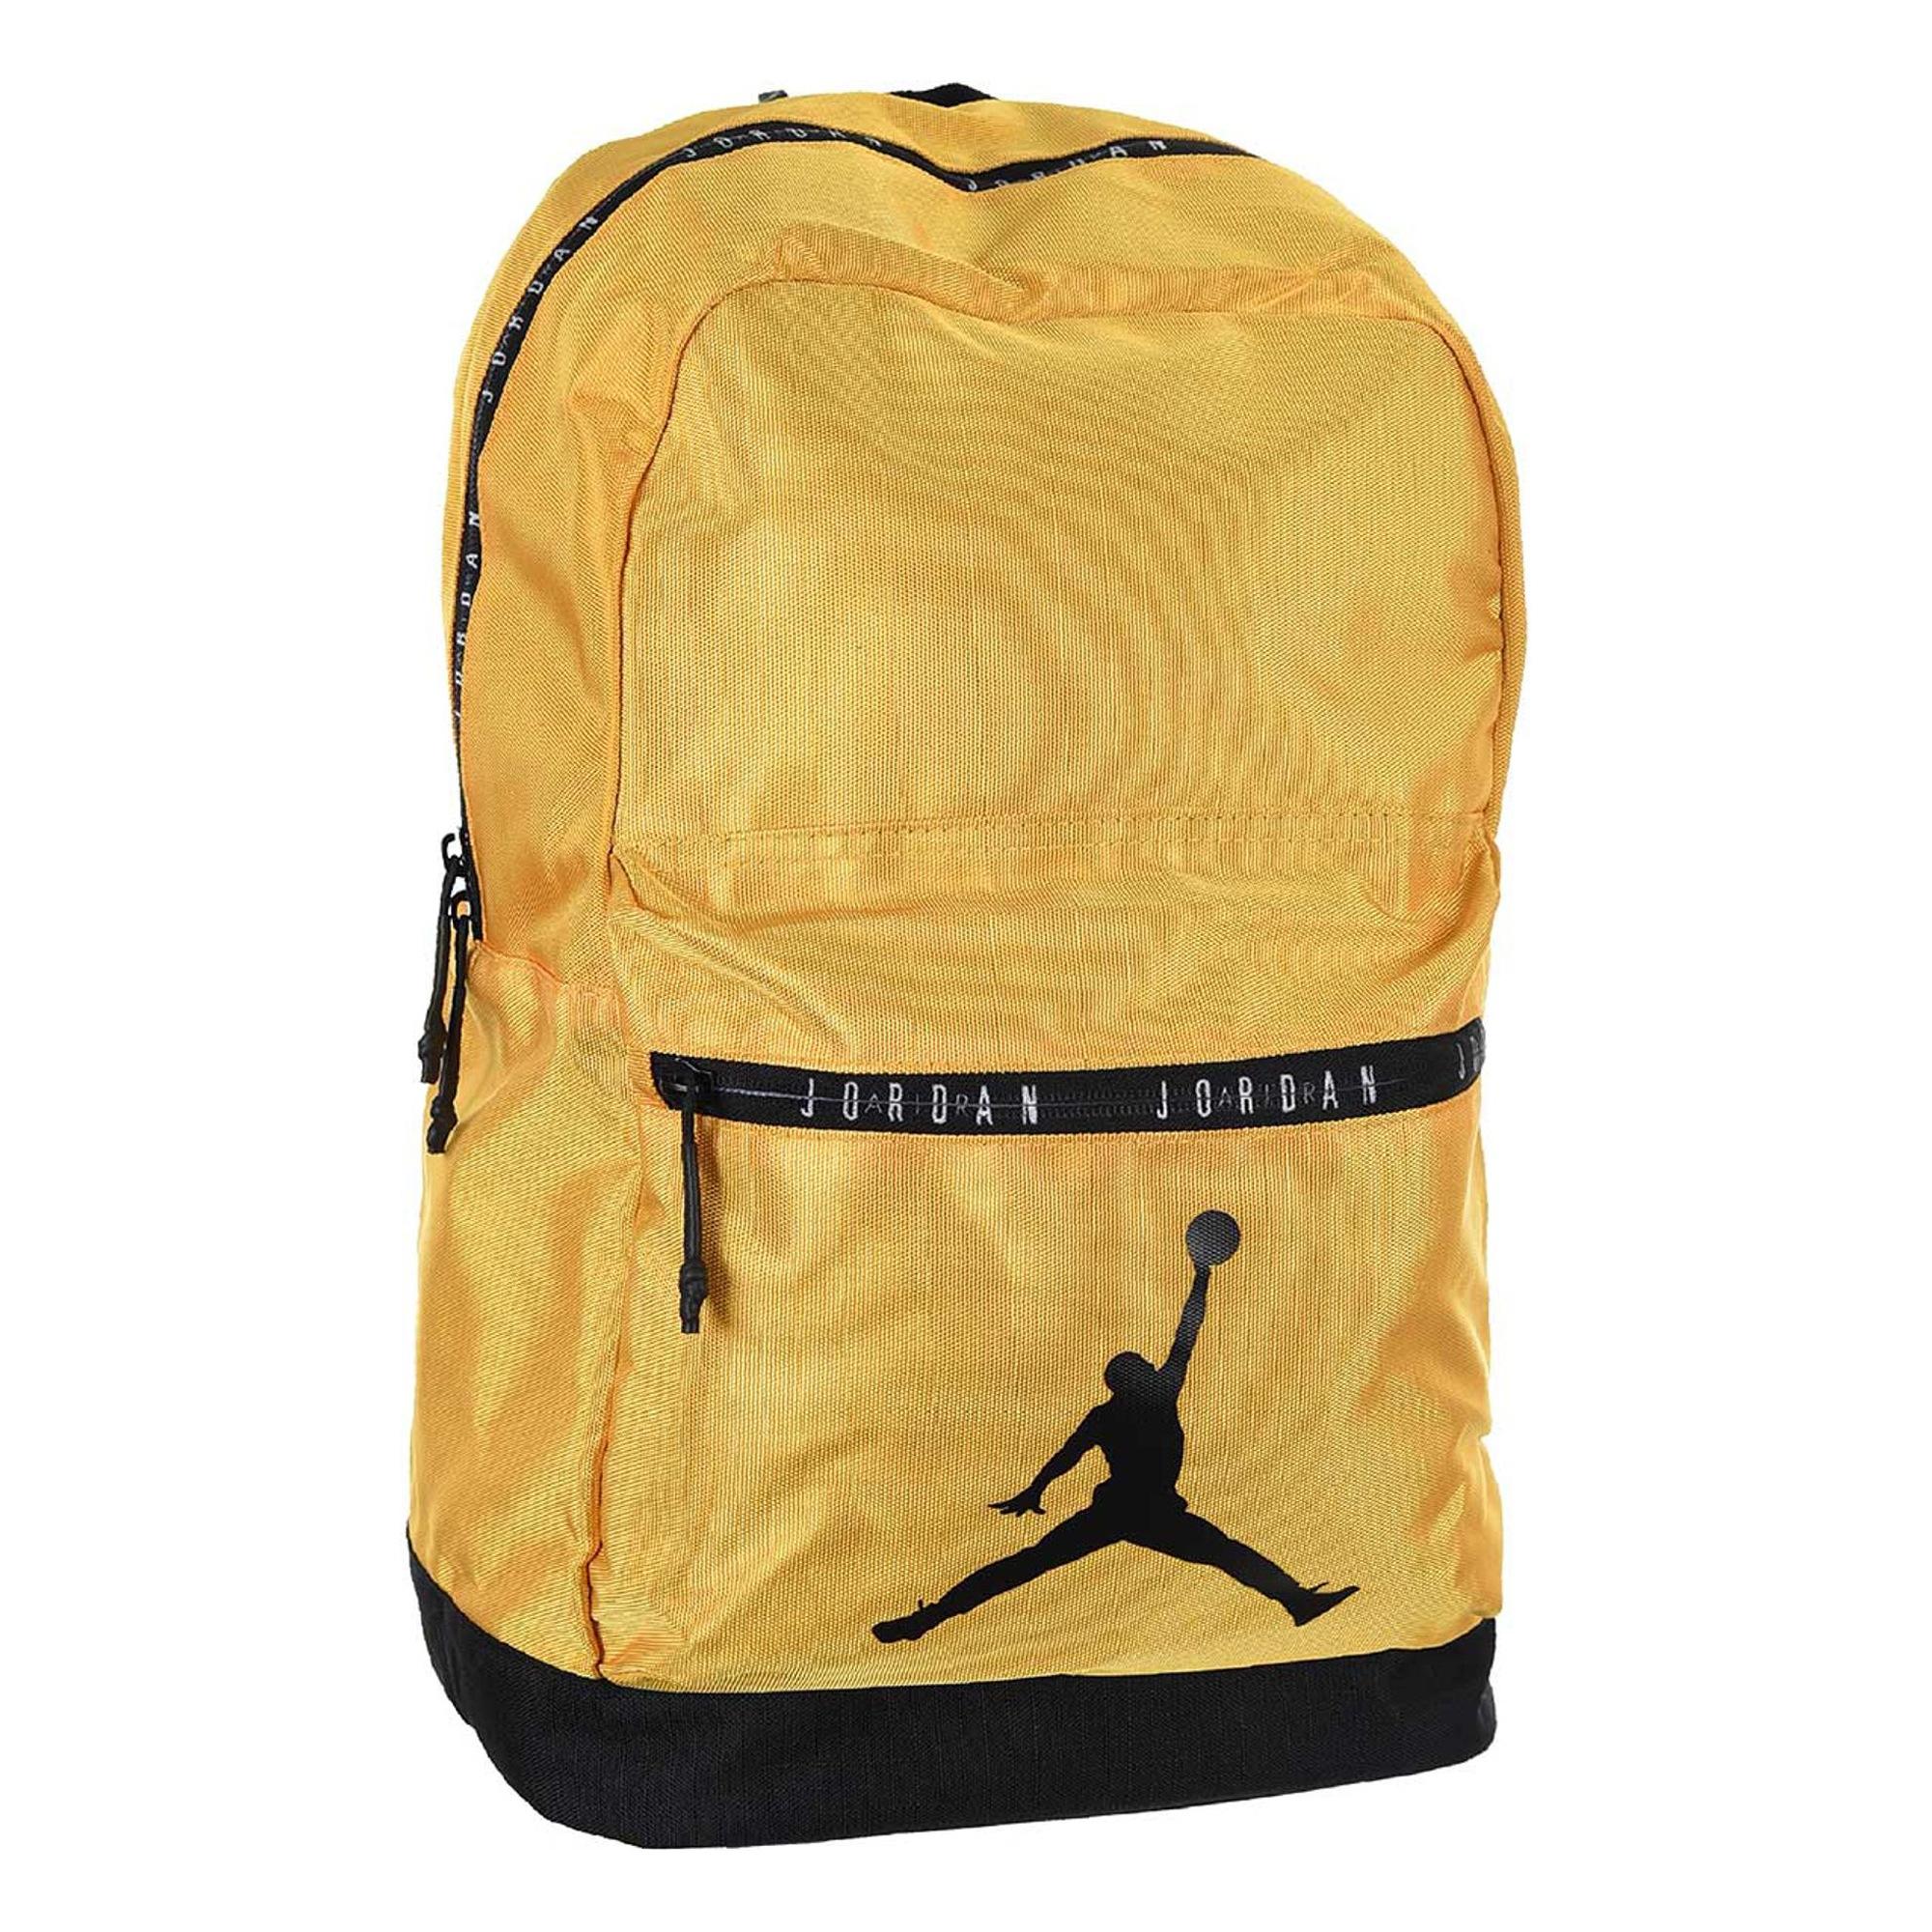 Mochila Jordan Classic Backpack amarilla/negra - Privalia